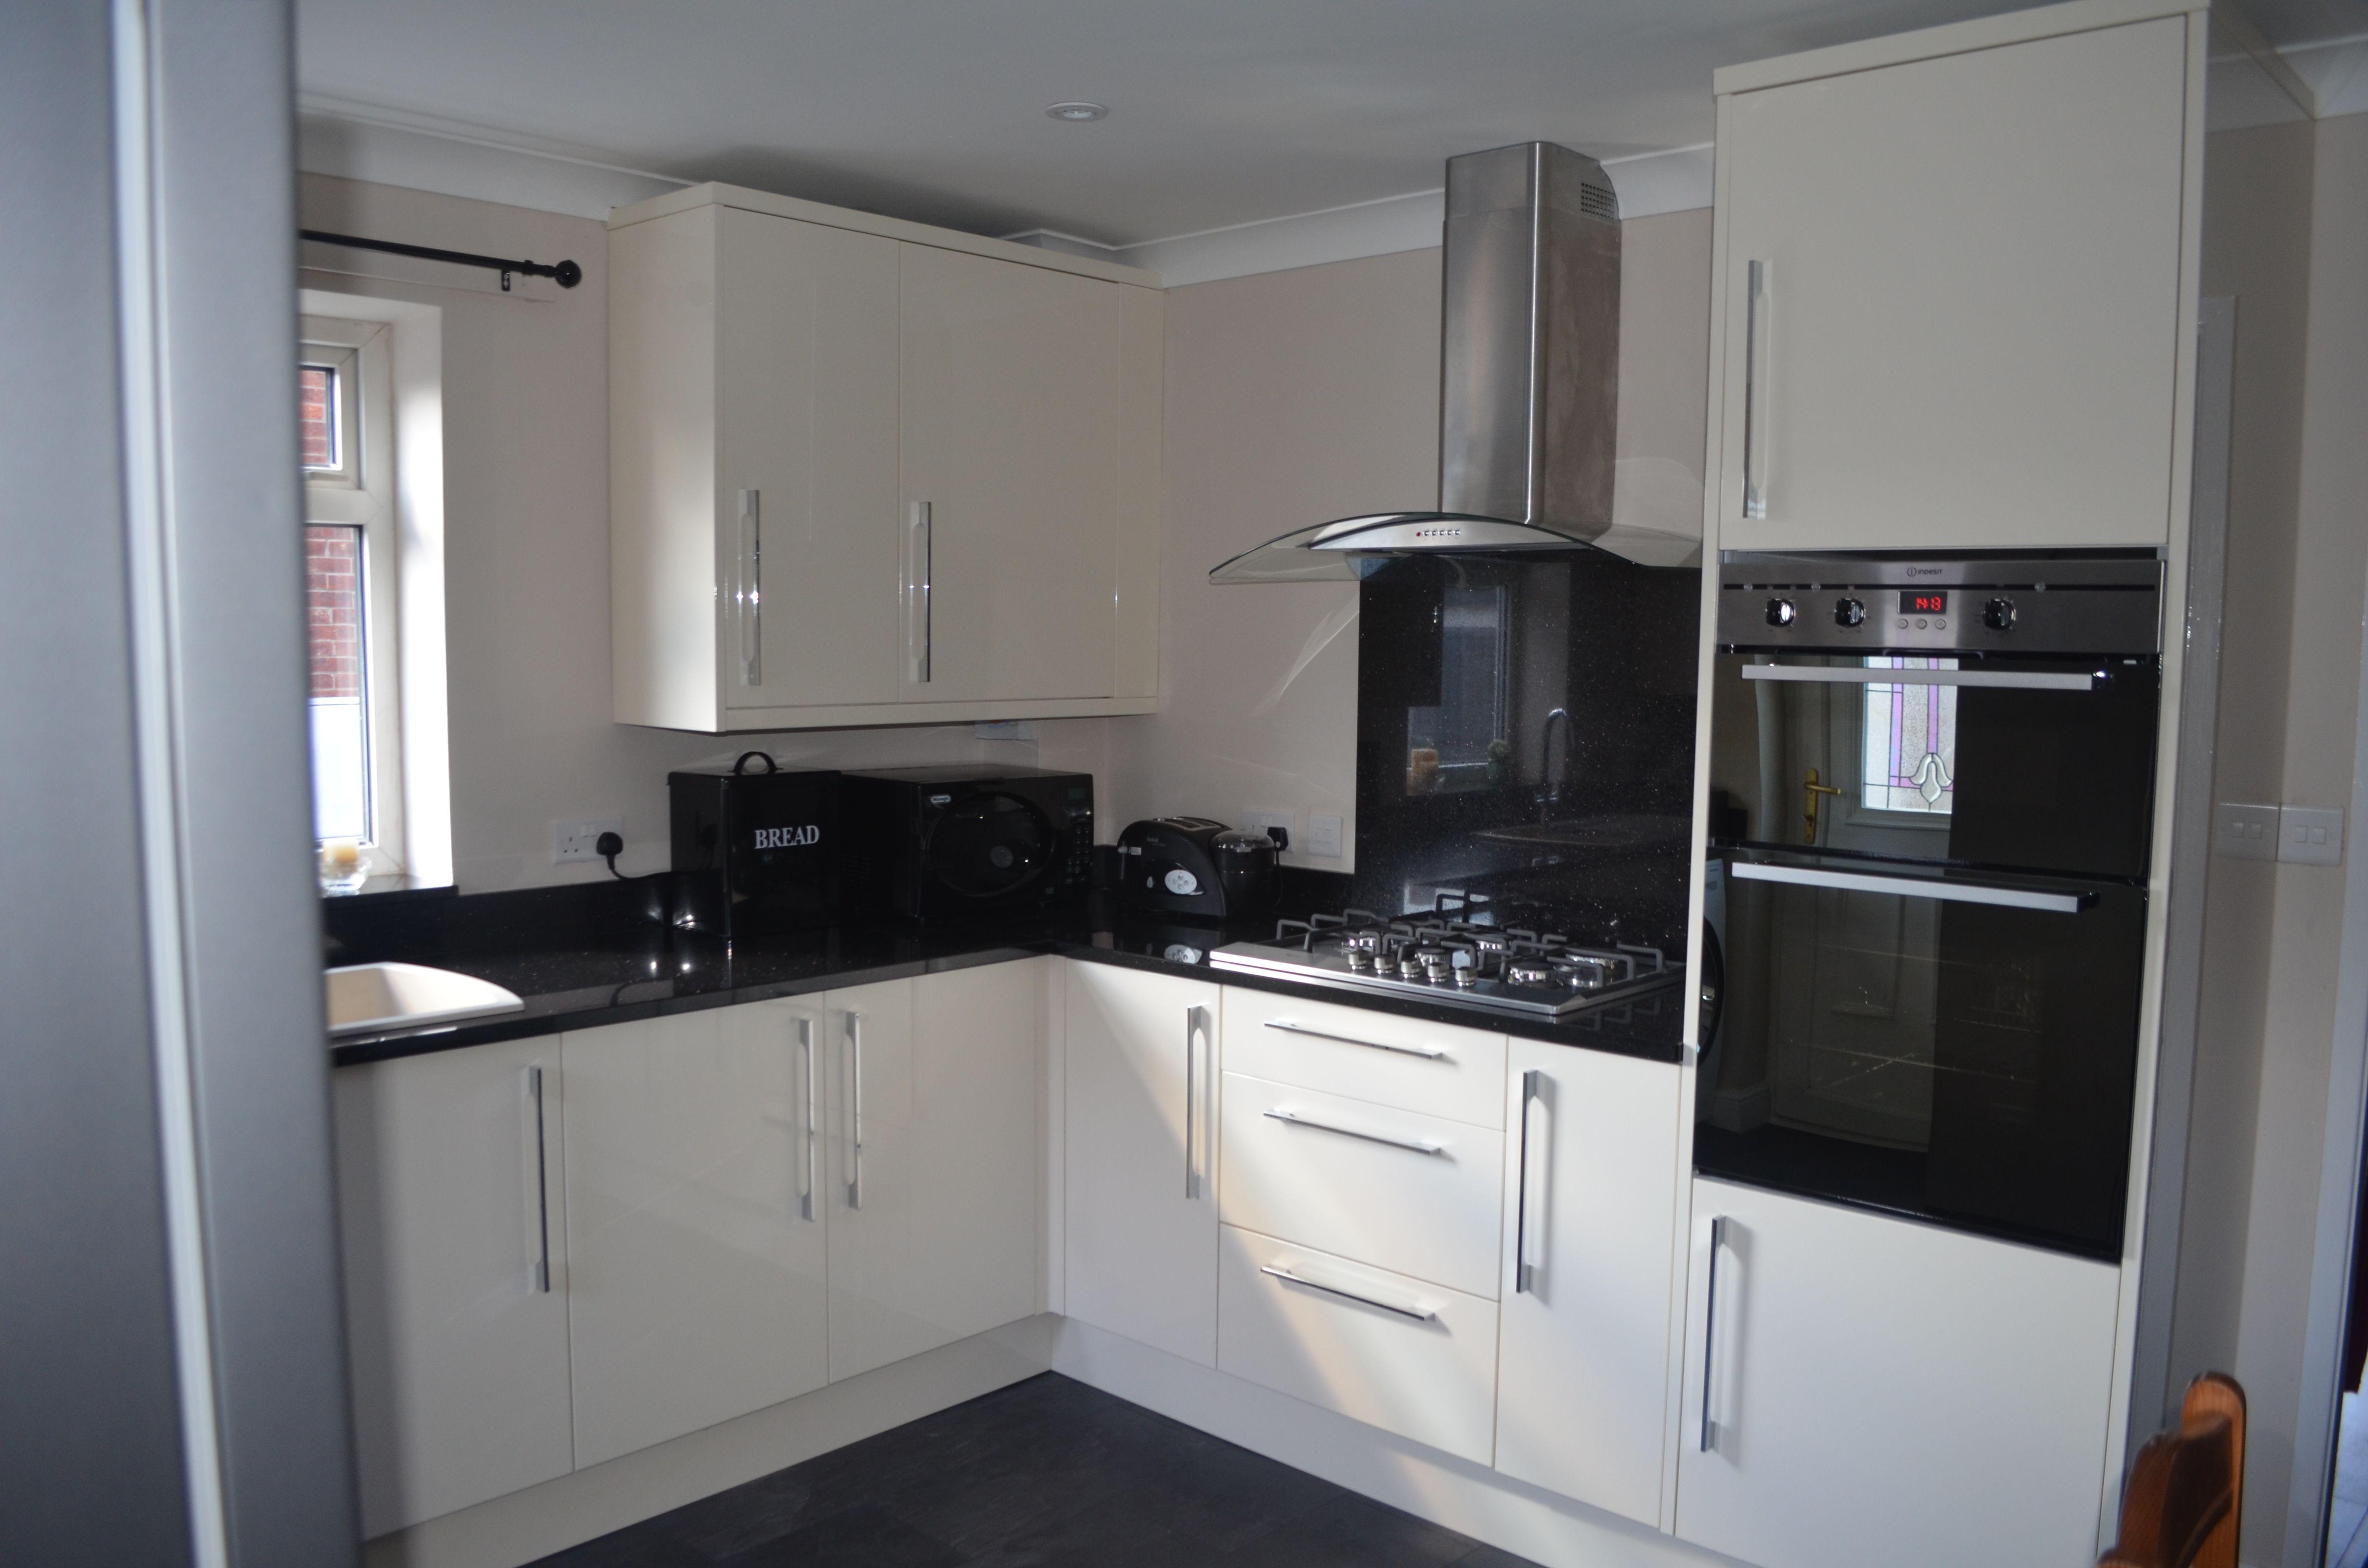 Home kitchen collection kitchen families glendevon family glendevon - Kitchen In High Gloss Cream B Q